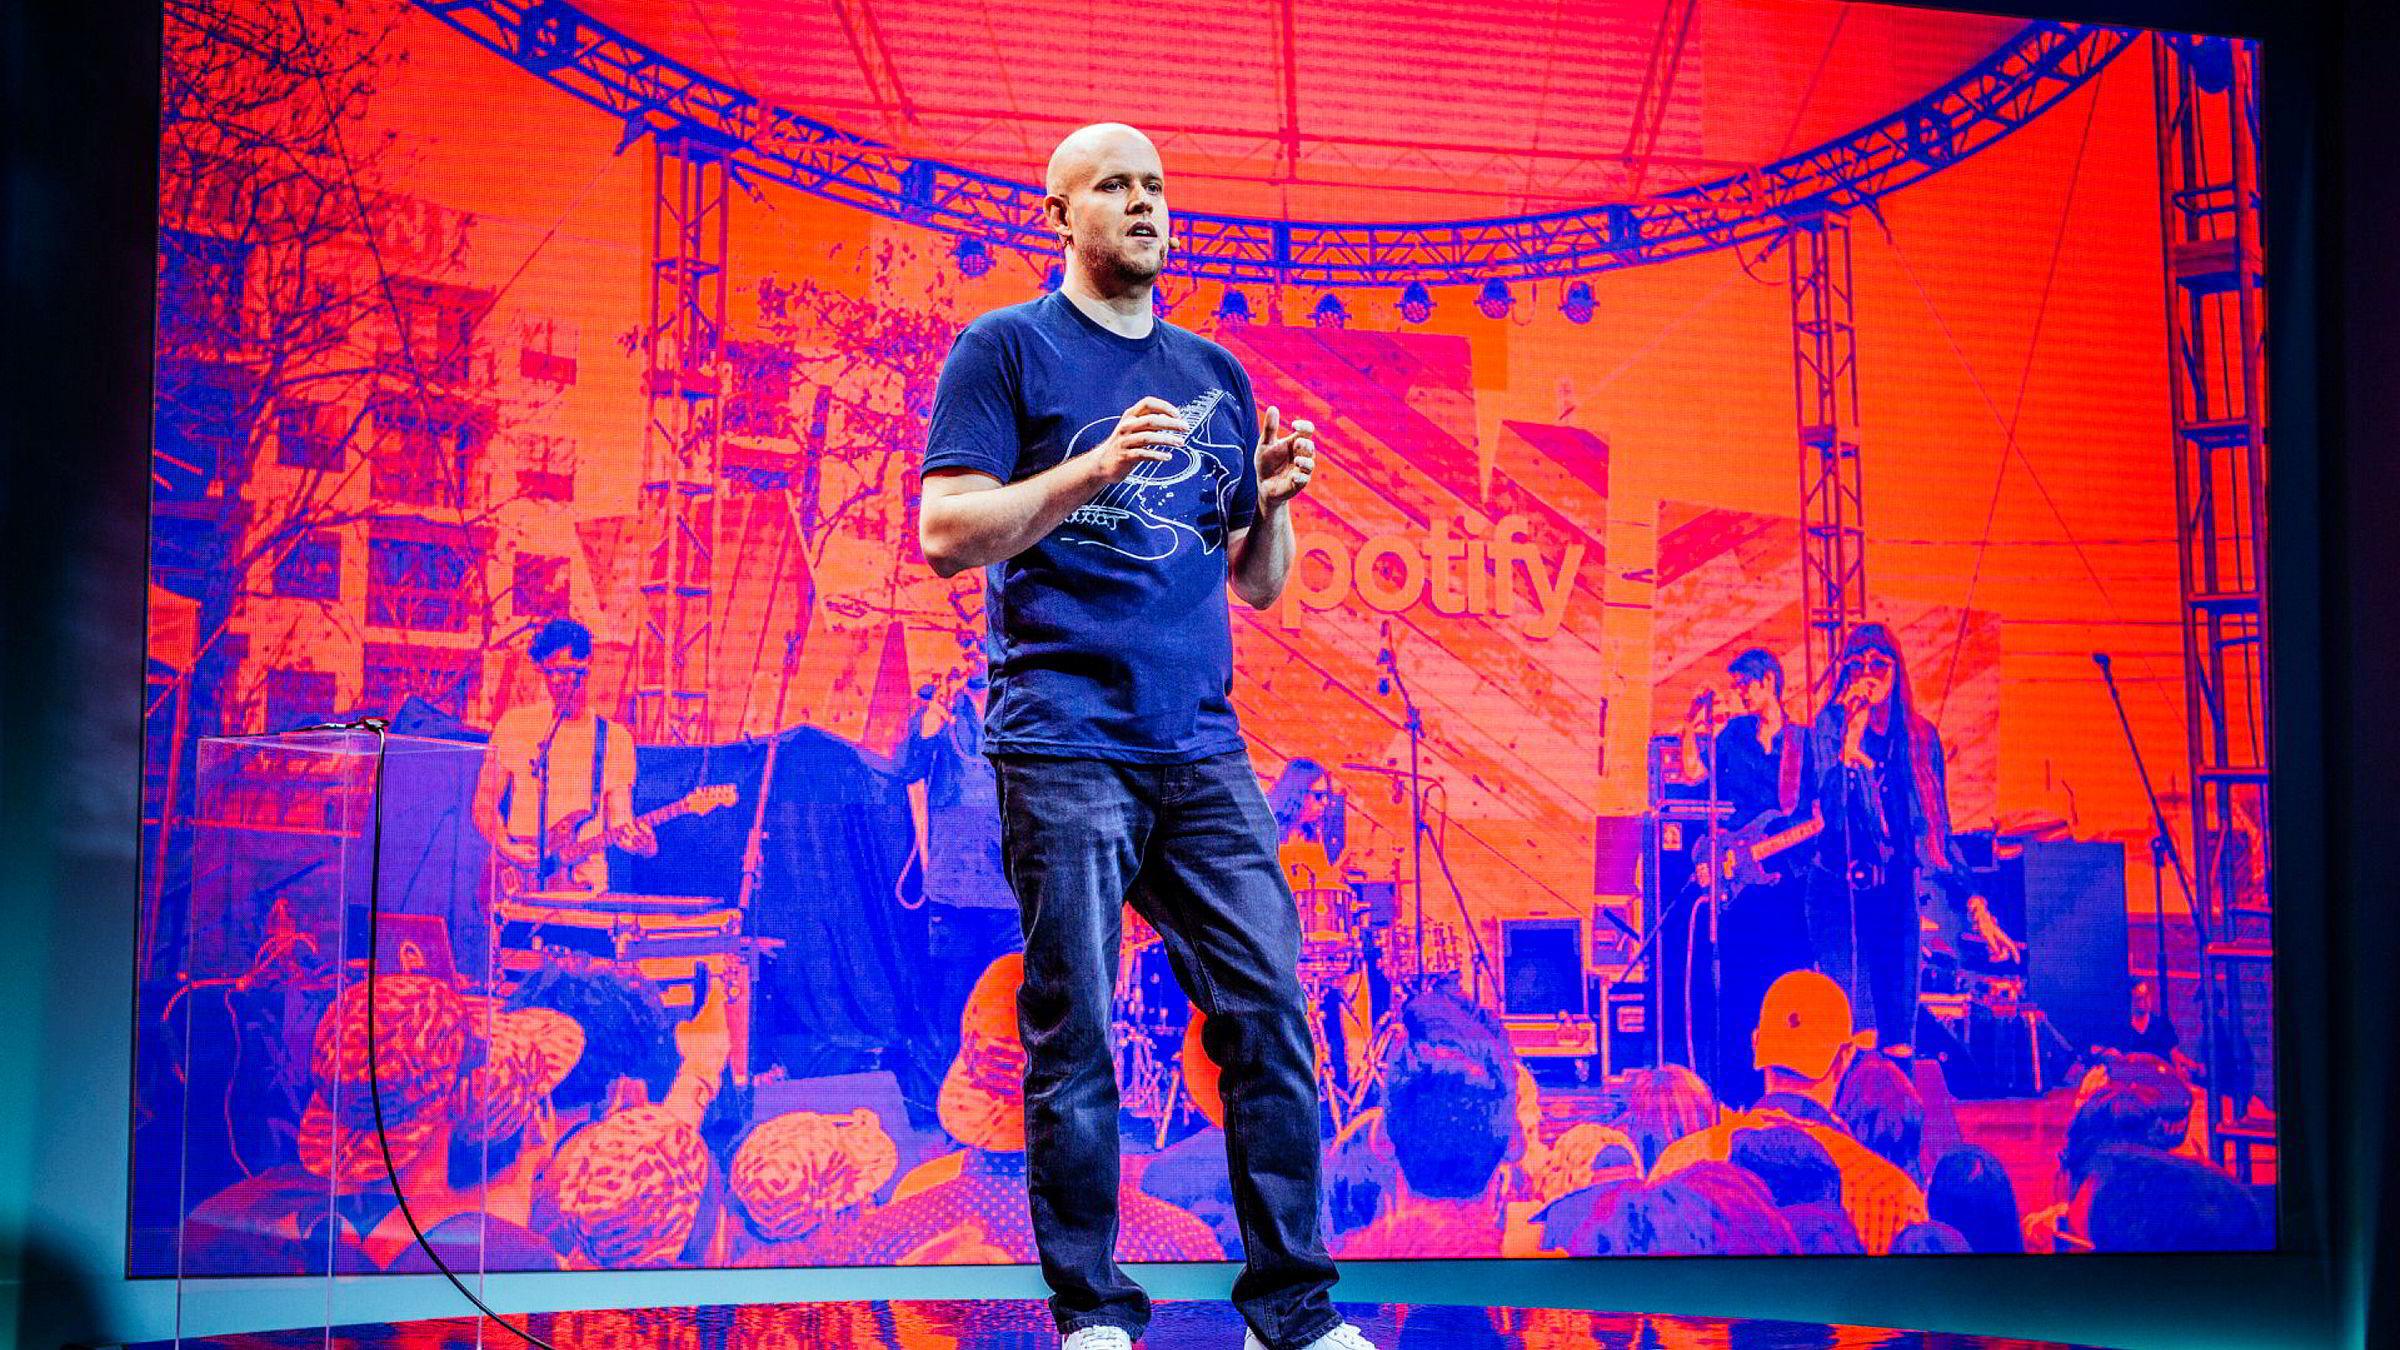 Gründer i Spotify, Daniel Ek.